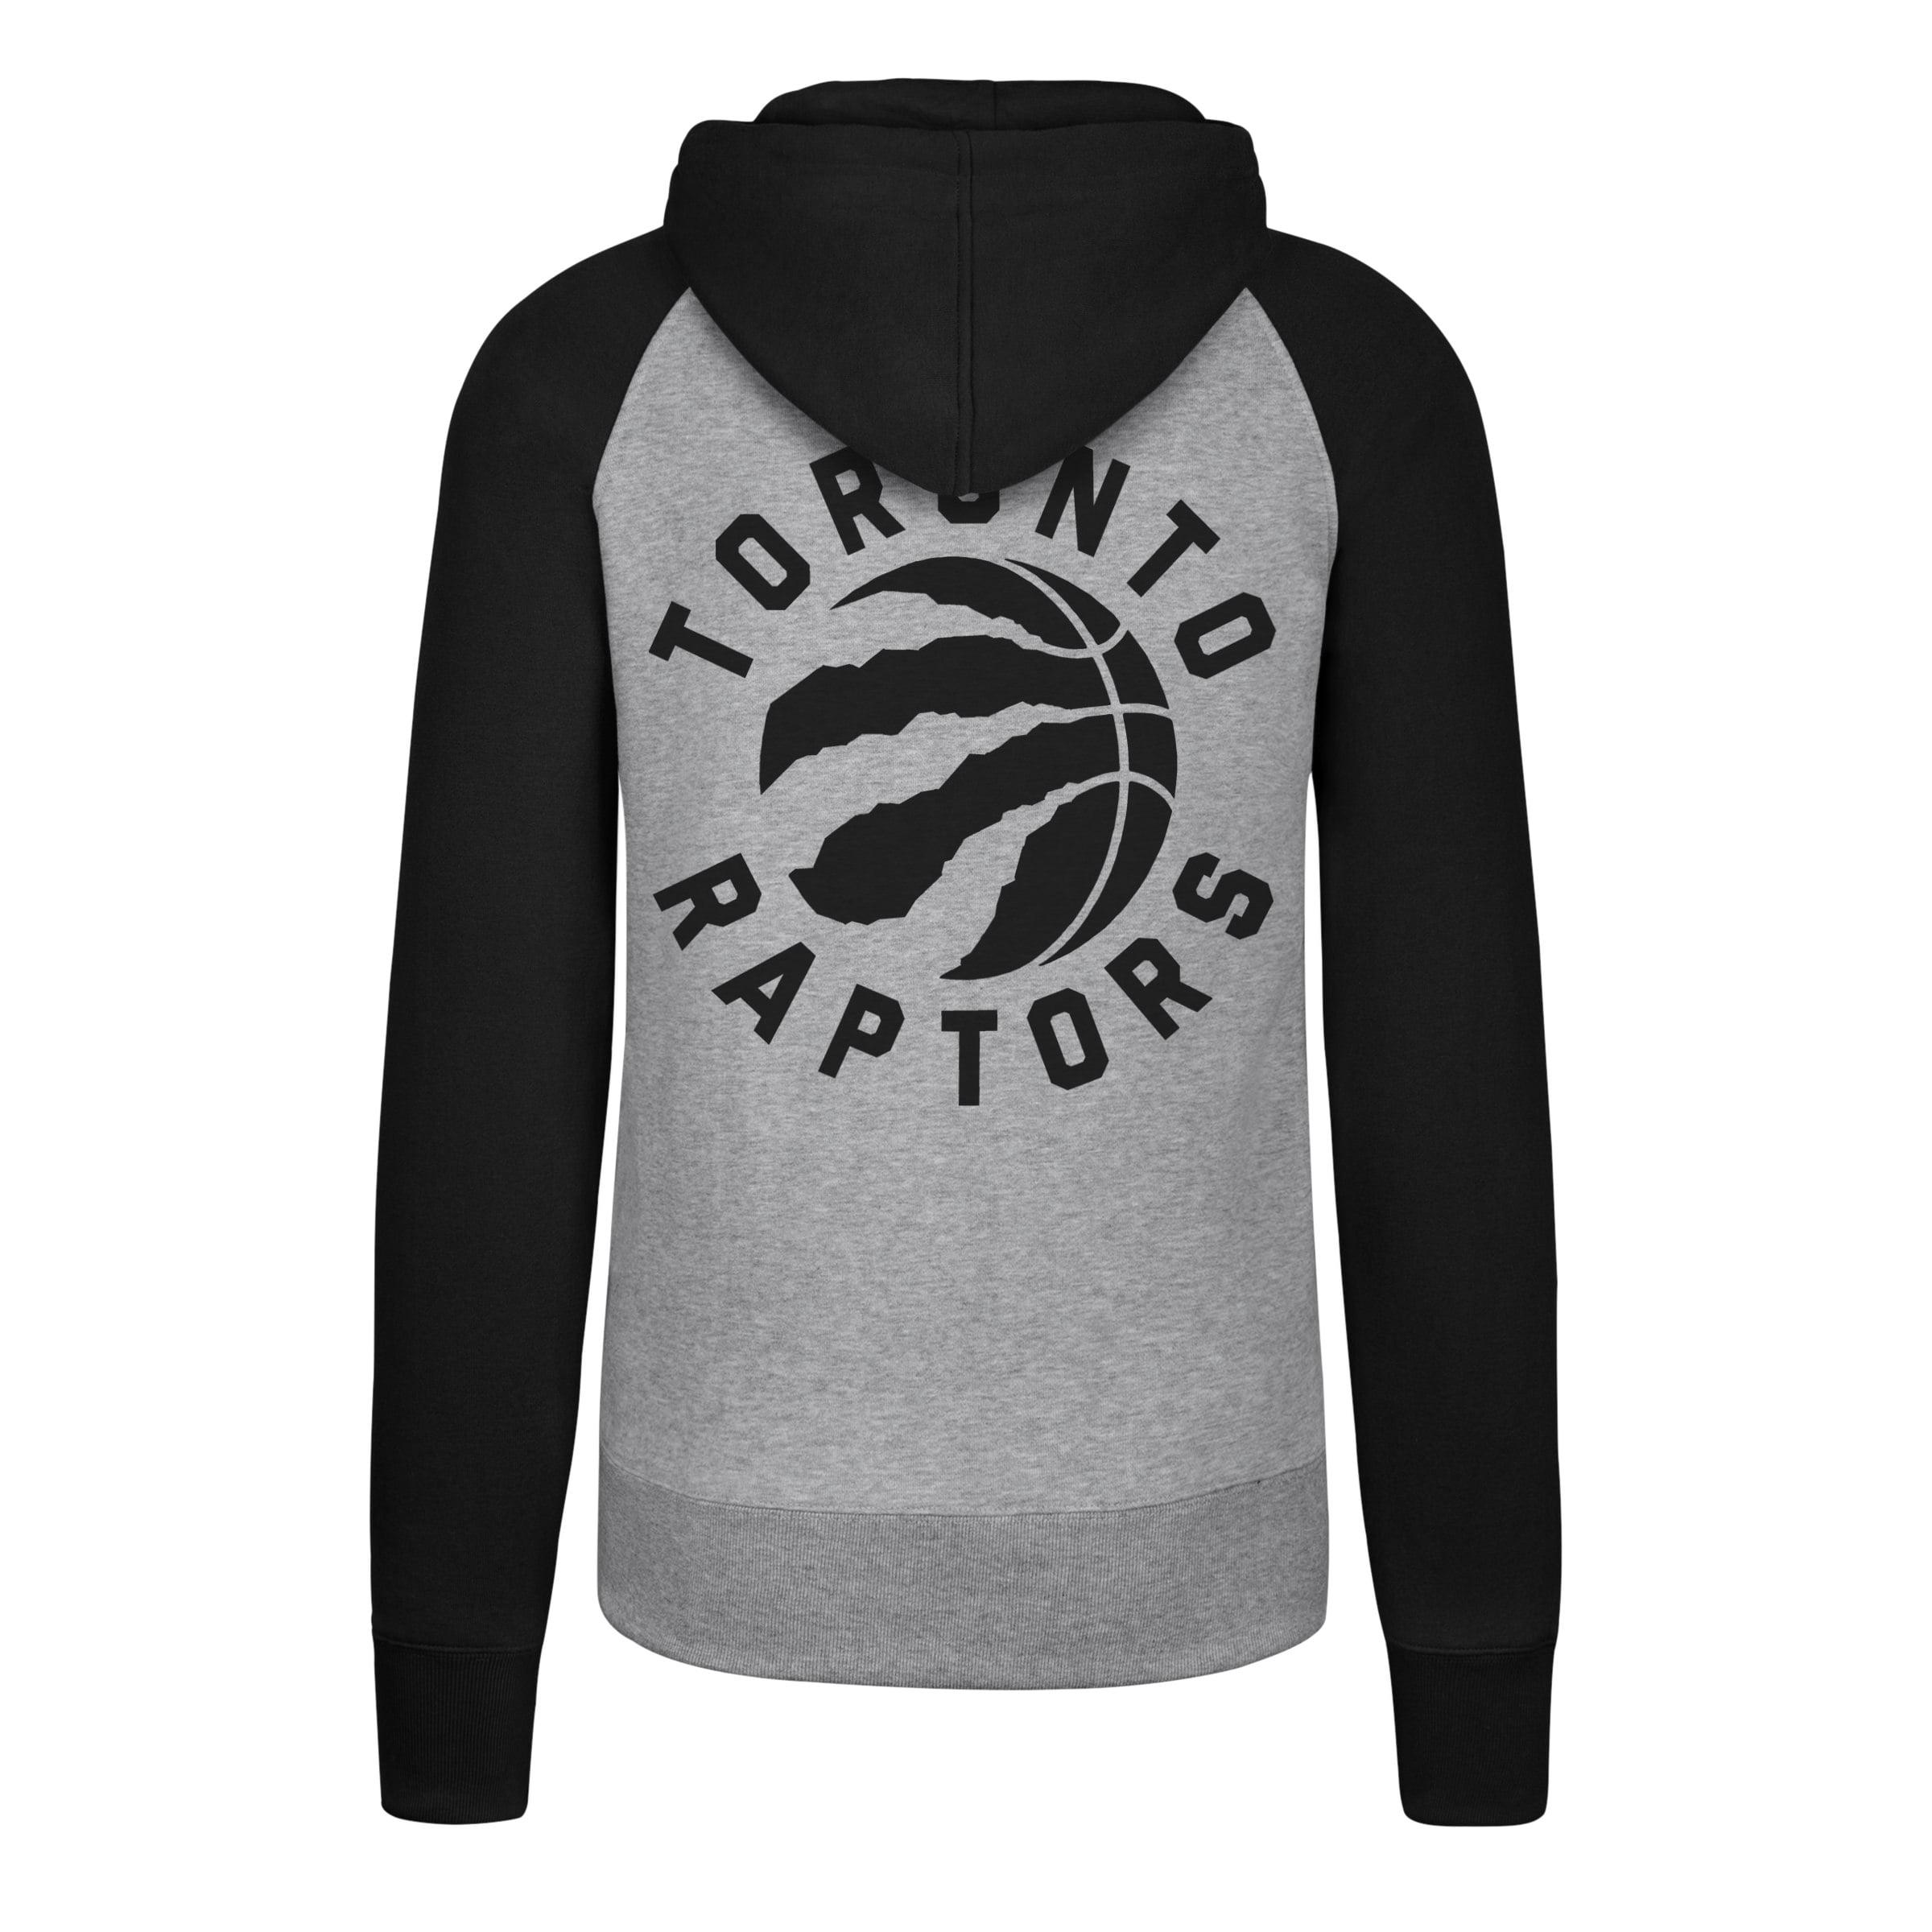 new styles 47980 c5c82 Toronto Raptors NBA Raglan Sport Hoodie | Walmart Canada